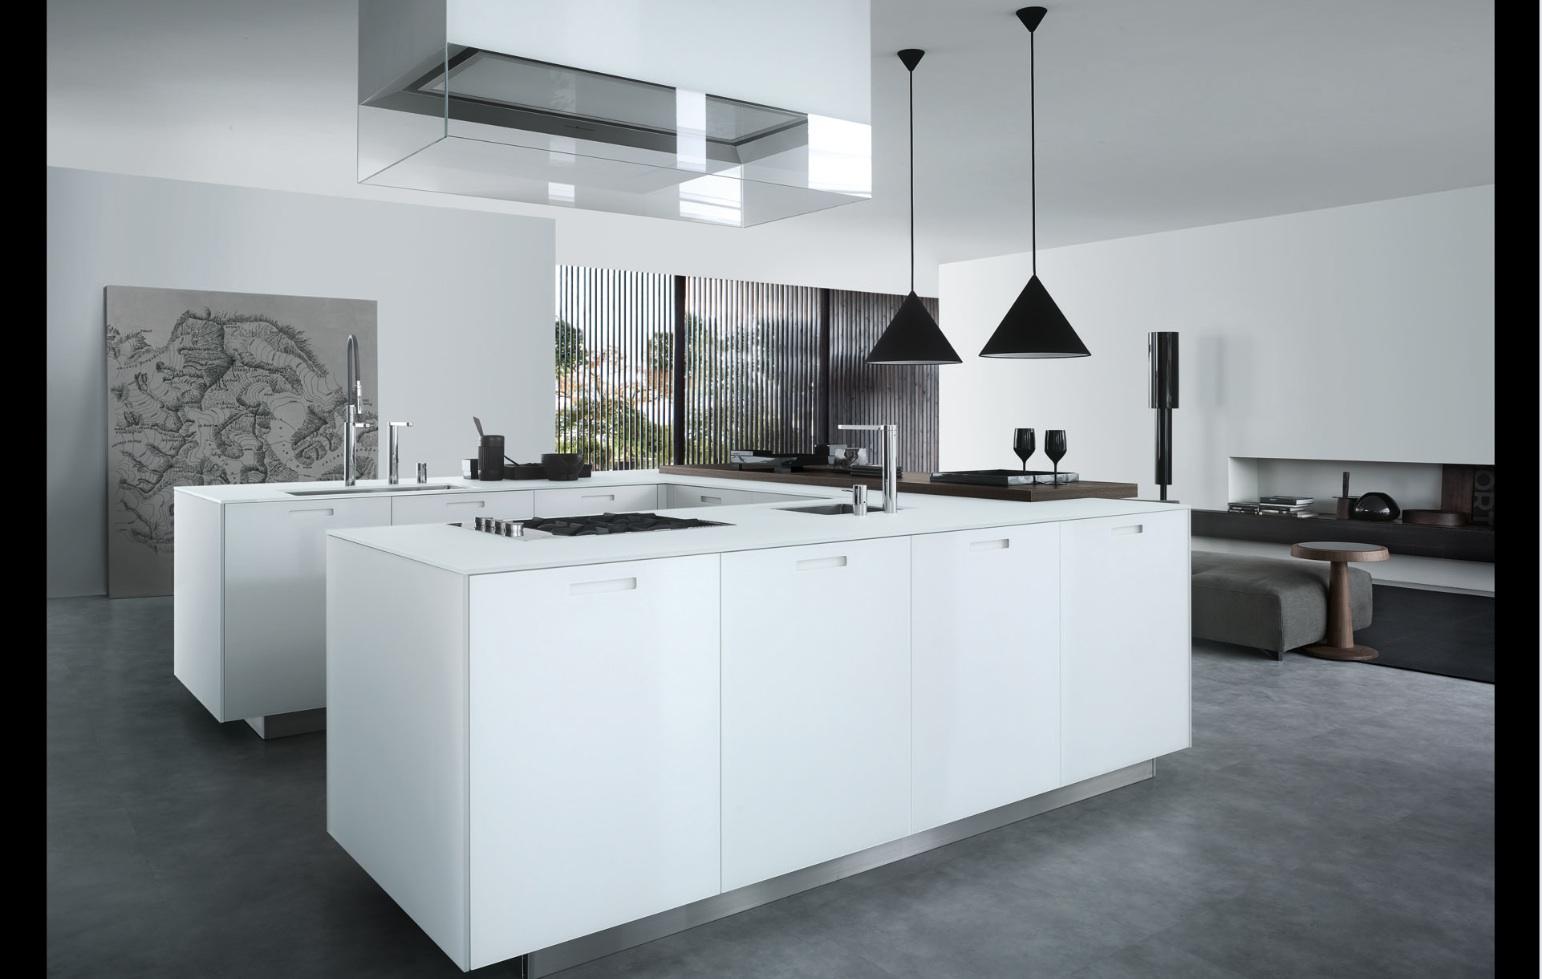 Maison grace varenna kyto kitchens for Varenna kitchen